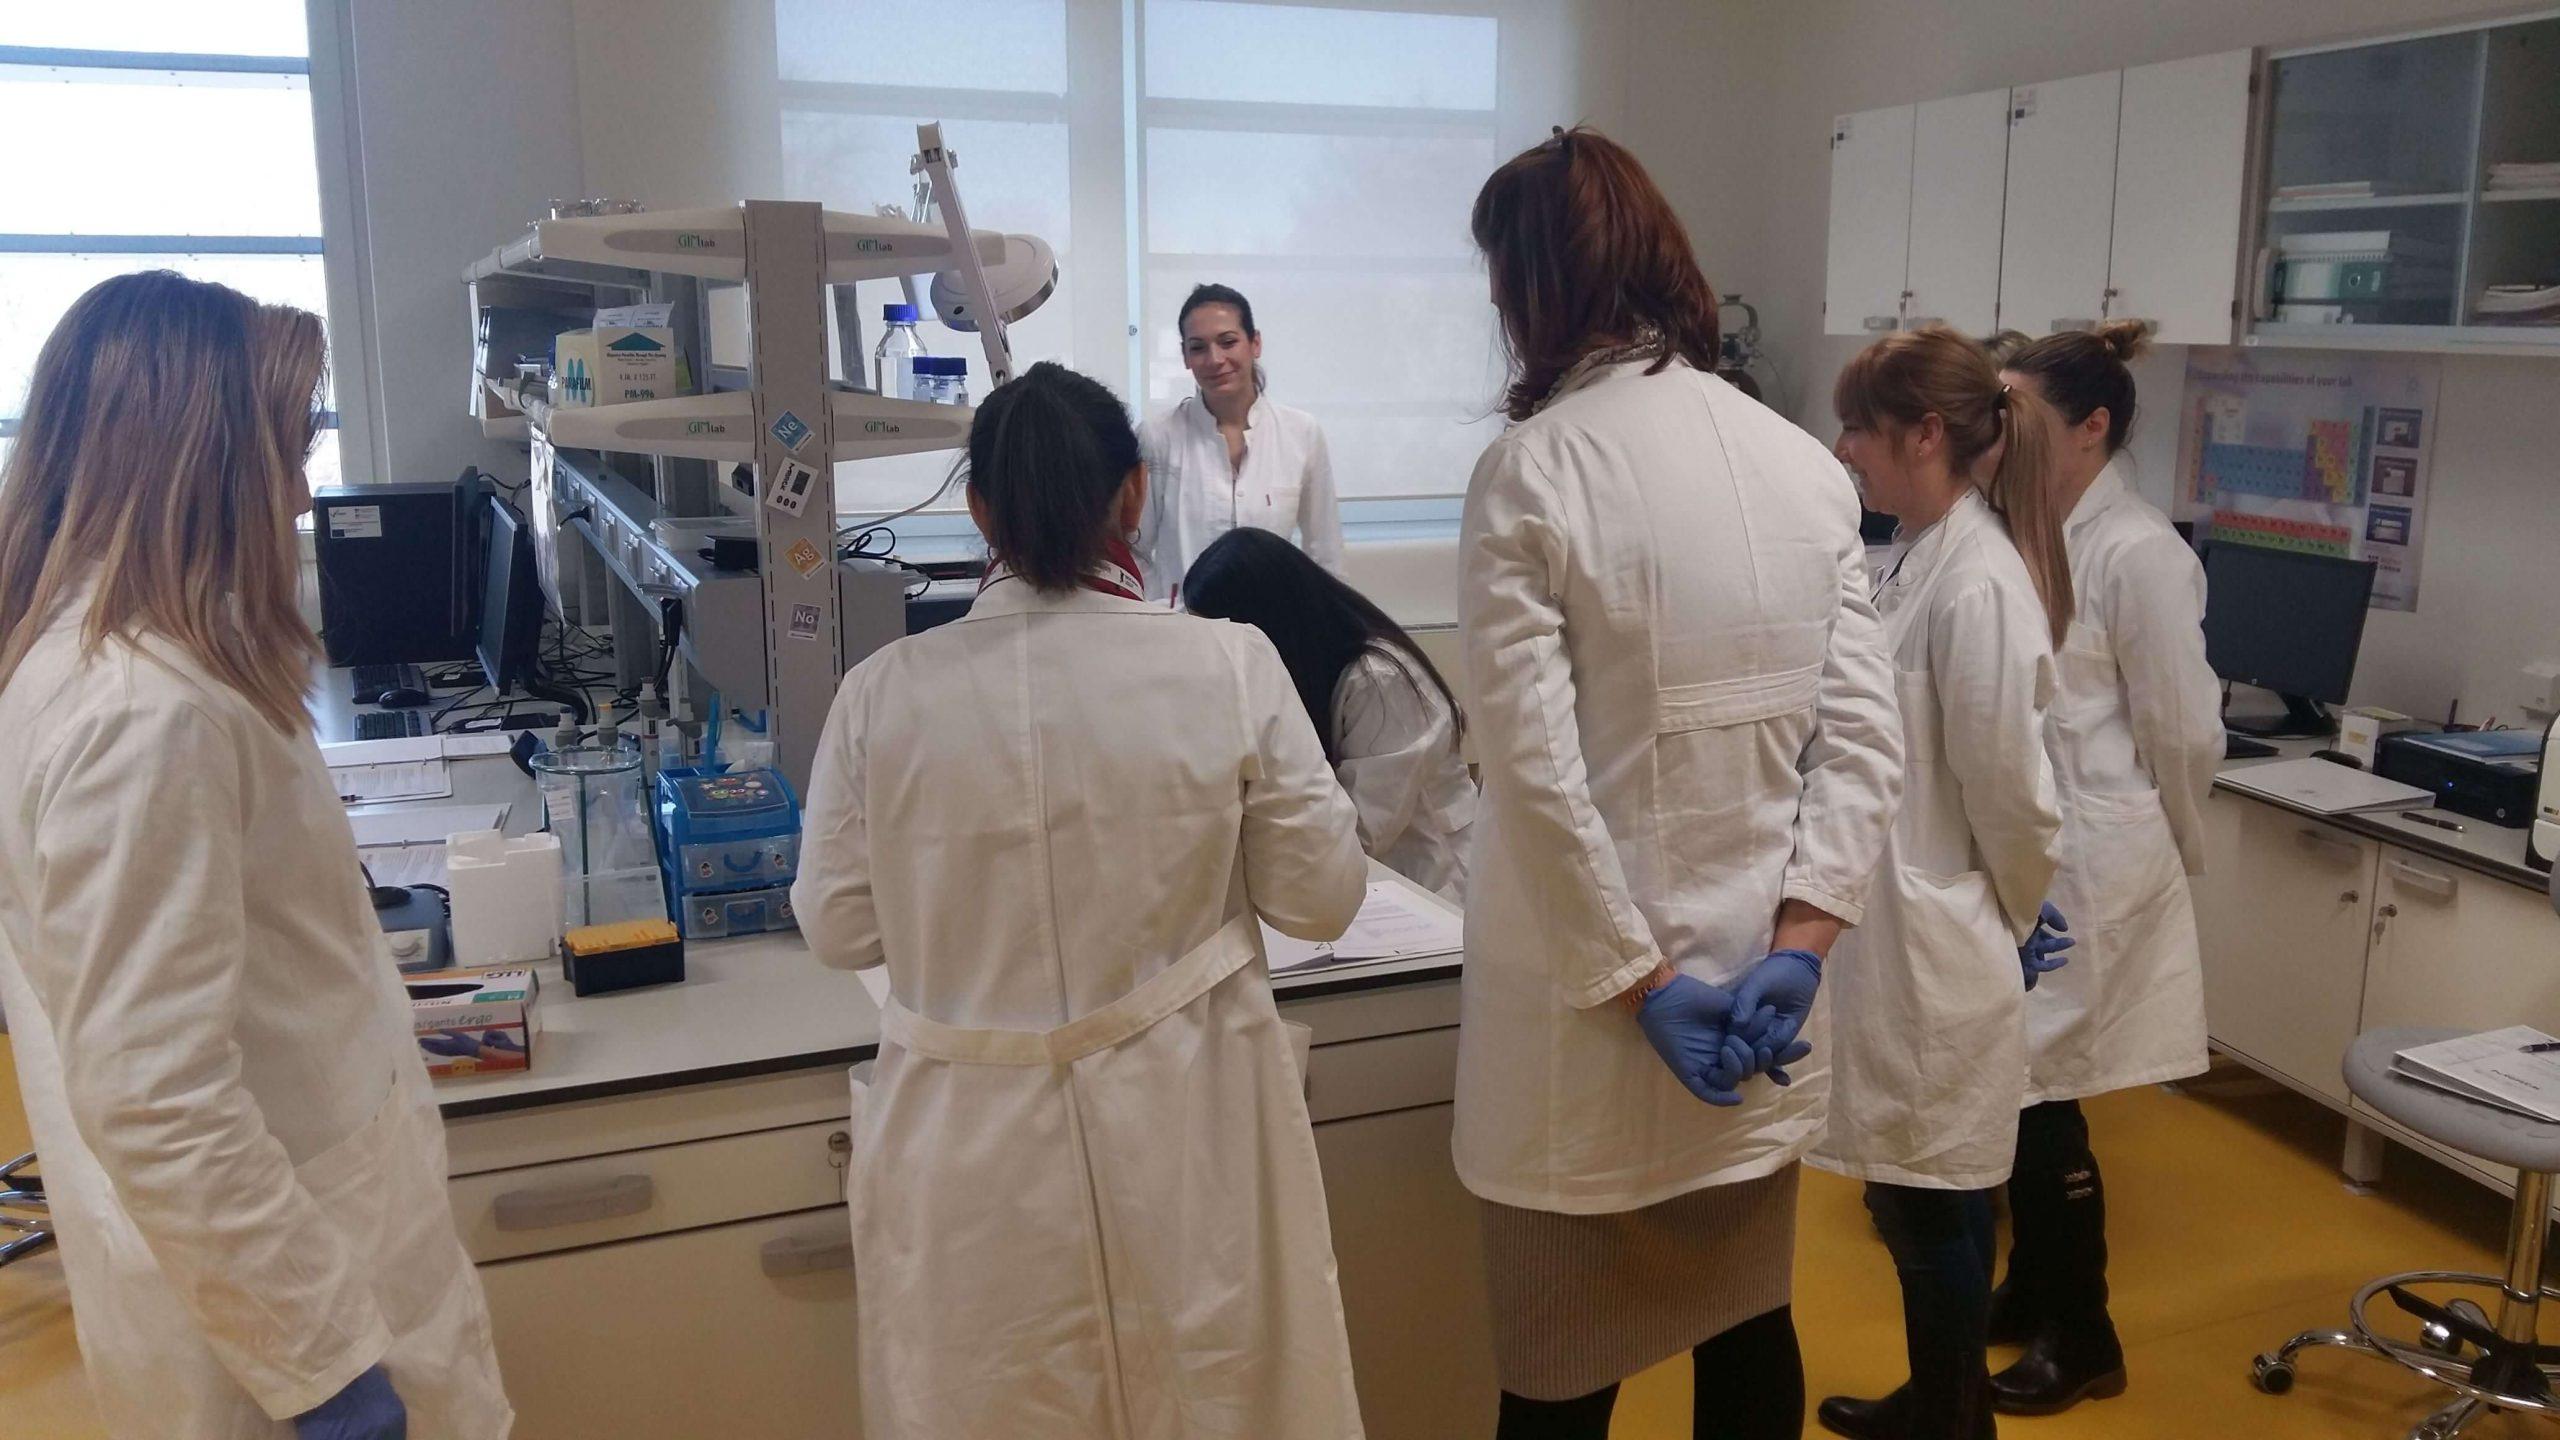 Osnove Proteomike Biocentar 2017 1 Scaled